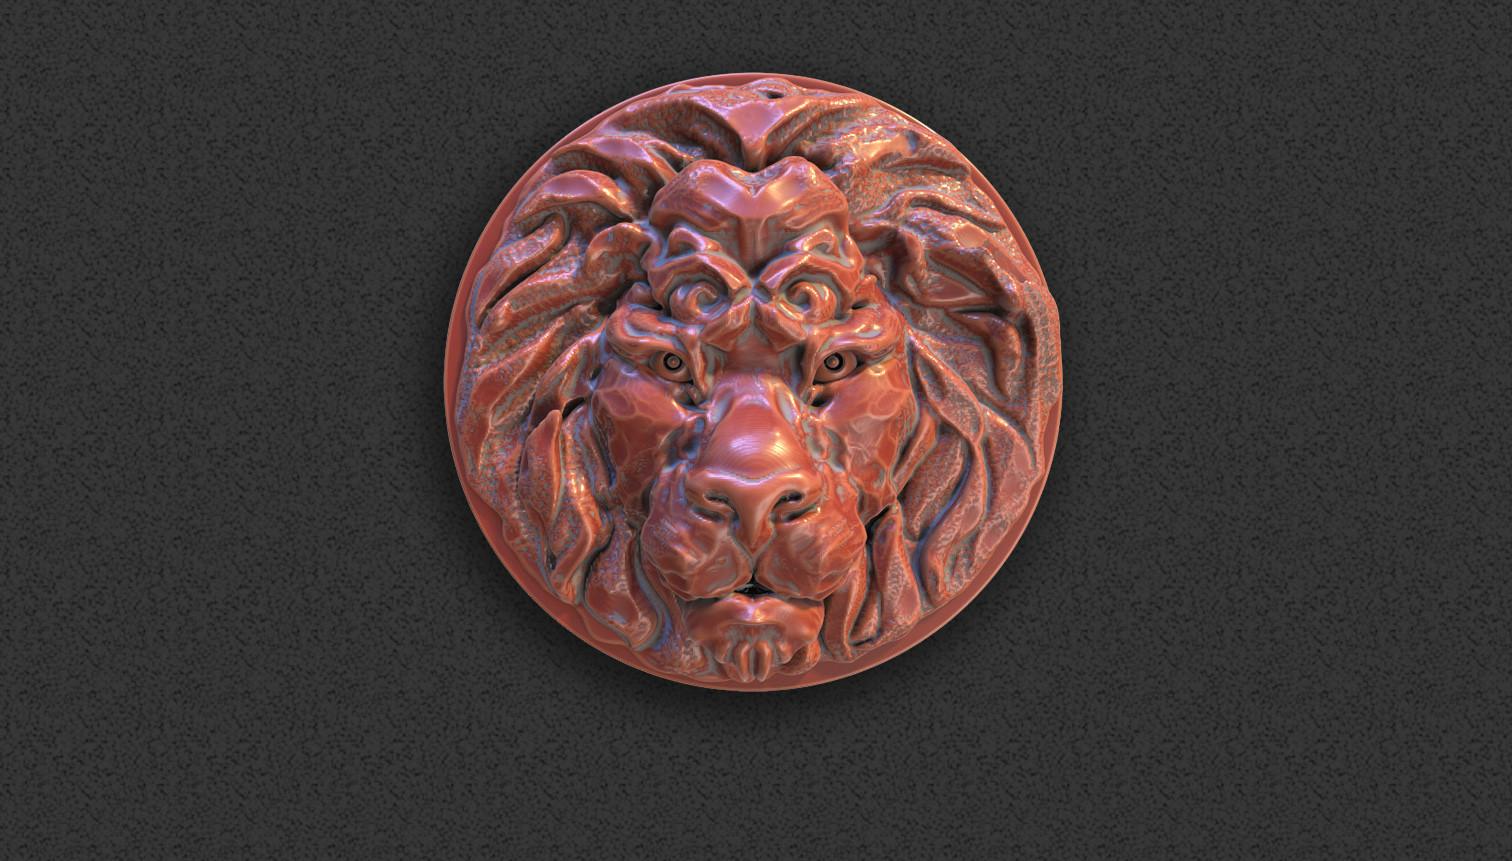 Konstantin gudym leon 003